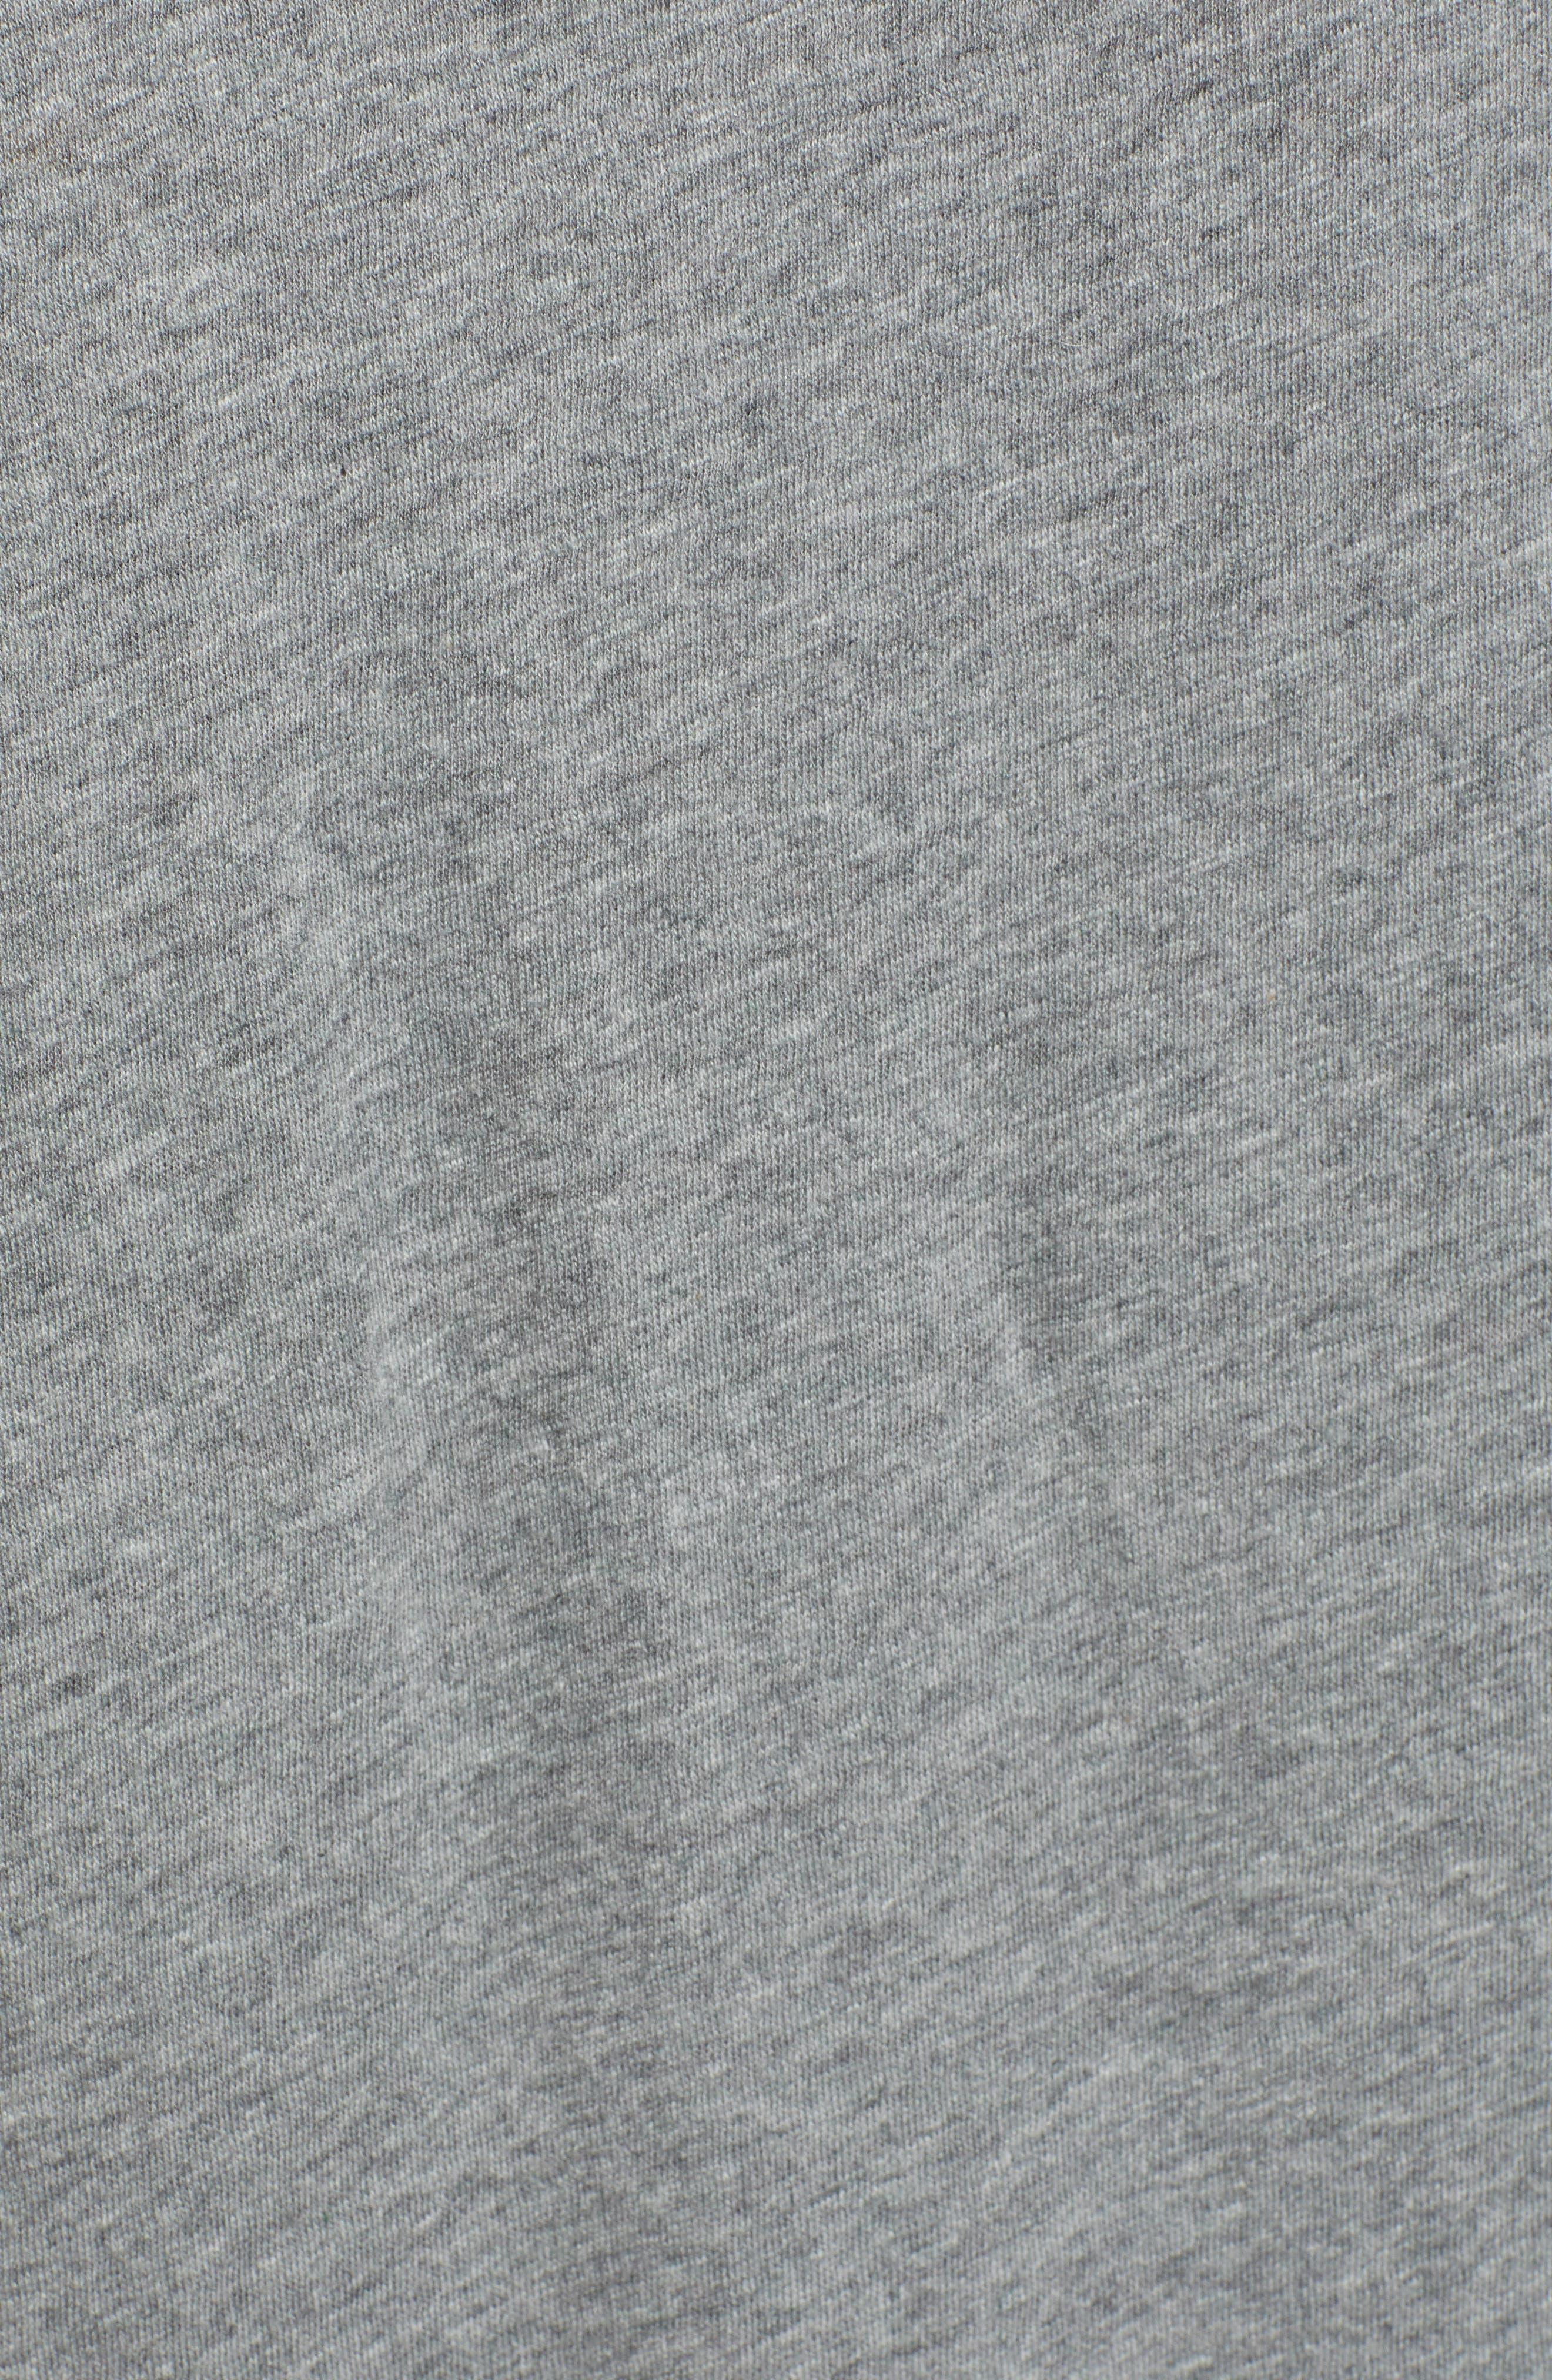 Knot Front T-Shirt Dress,                             Alternate thumbnail 6, color,                             GREY DARK HEATHER